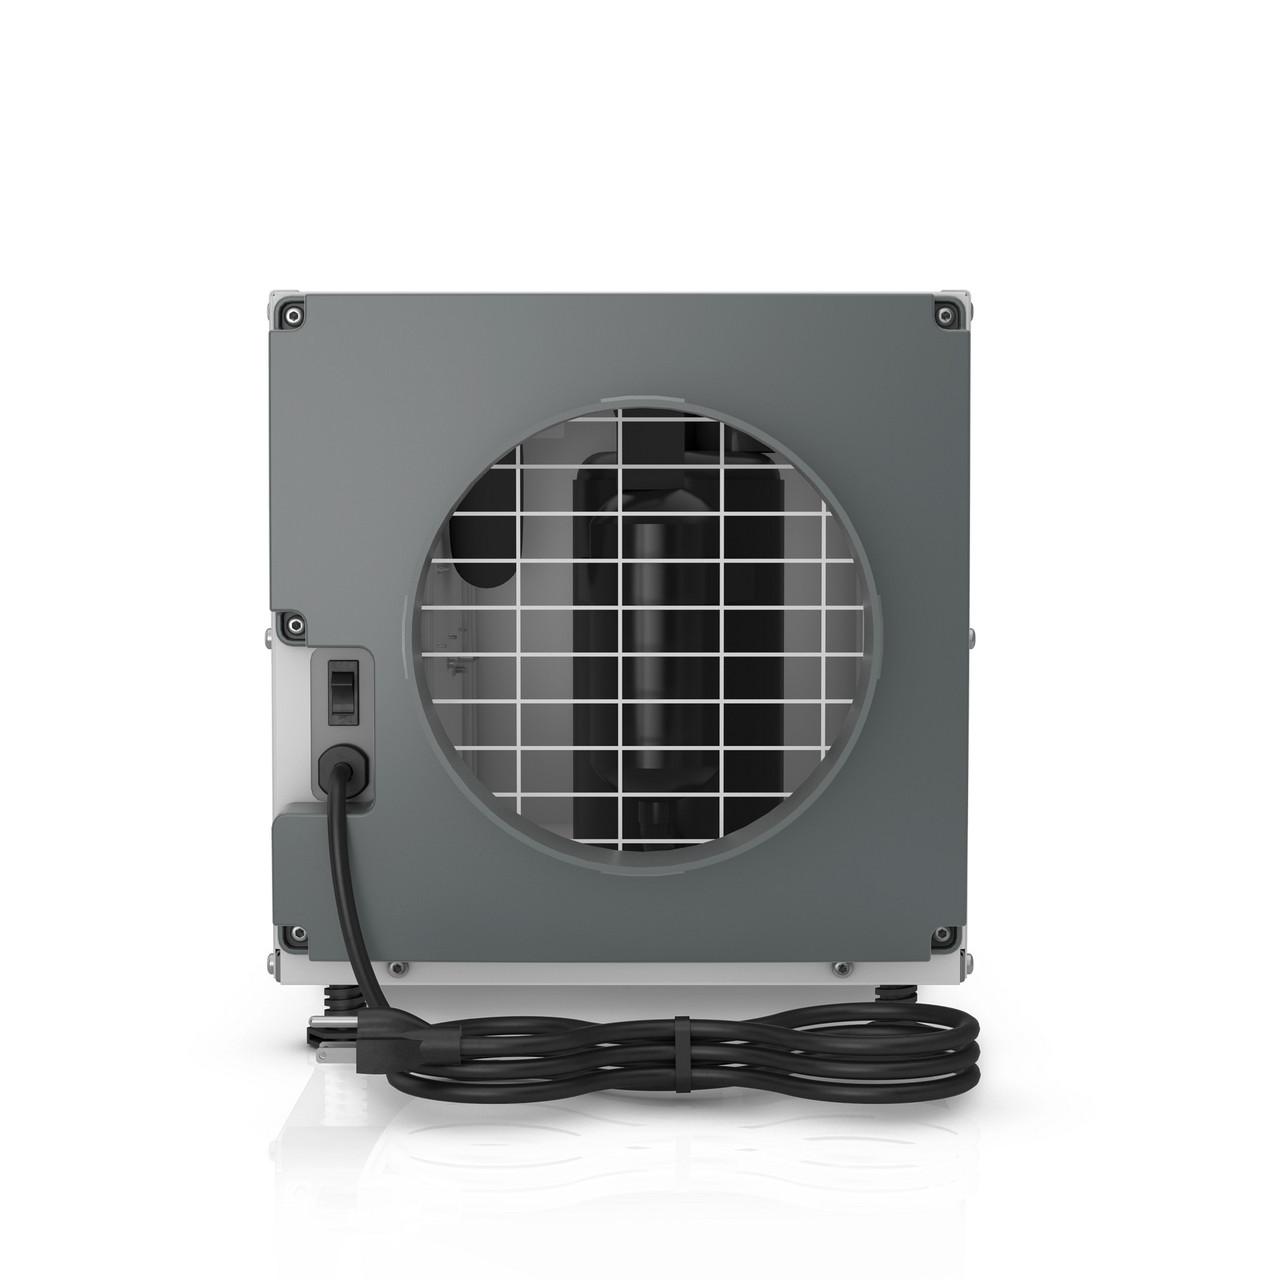 E70 Dehumidifier Supply Side